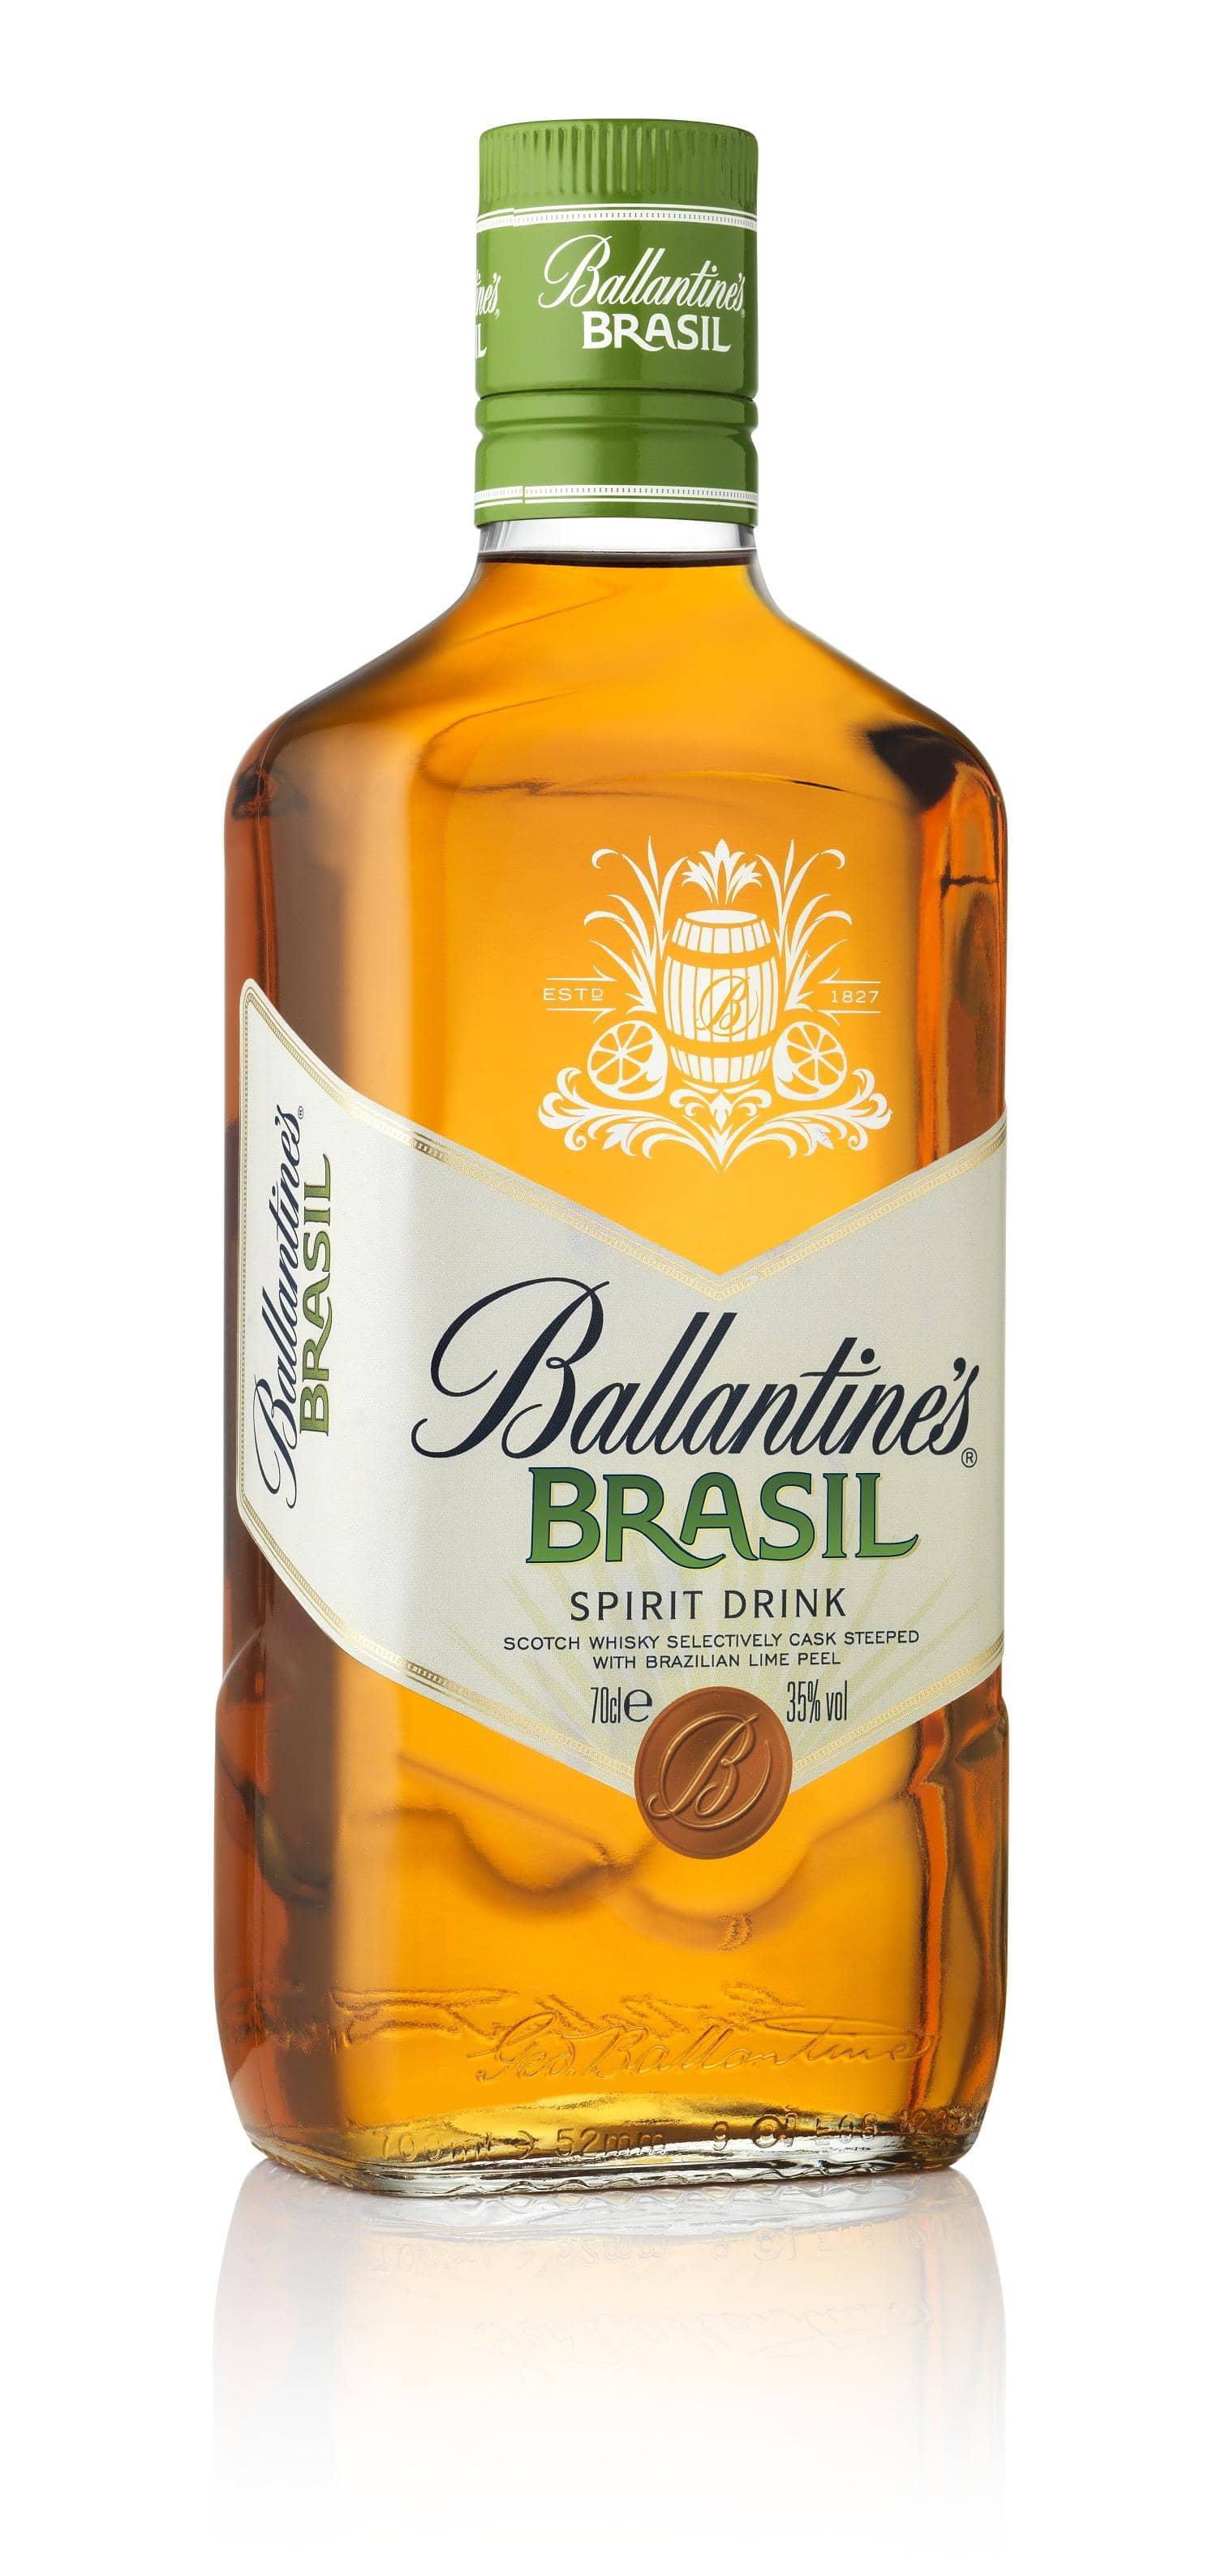 AA-Ballantines-Brasil-2